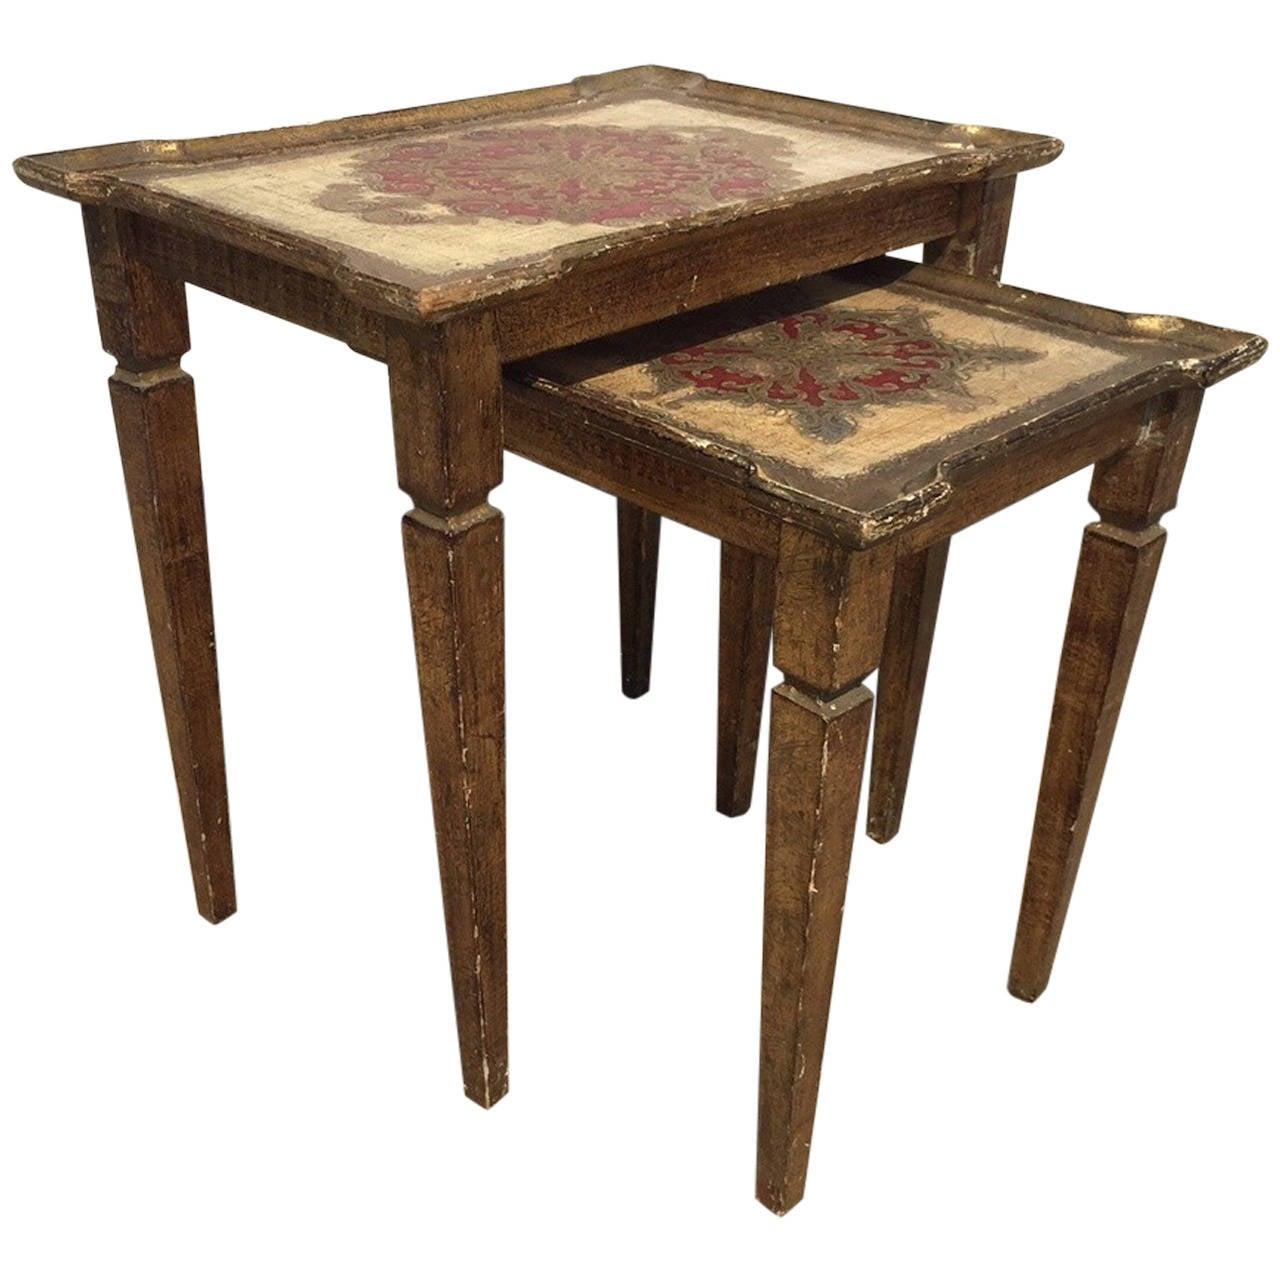 Early 1900s Italian Gilt Nesting Tables, Polychromed For Sale